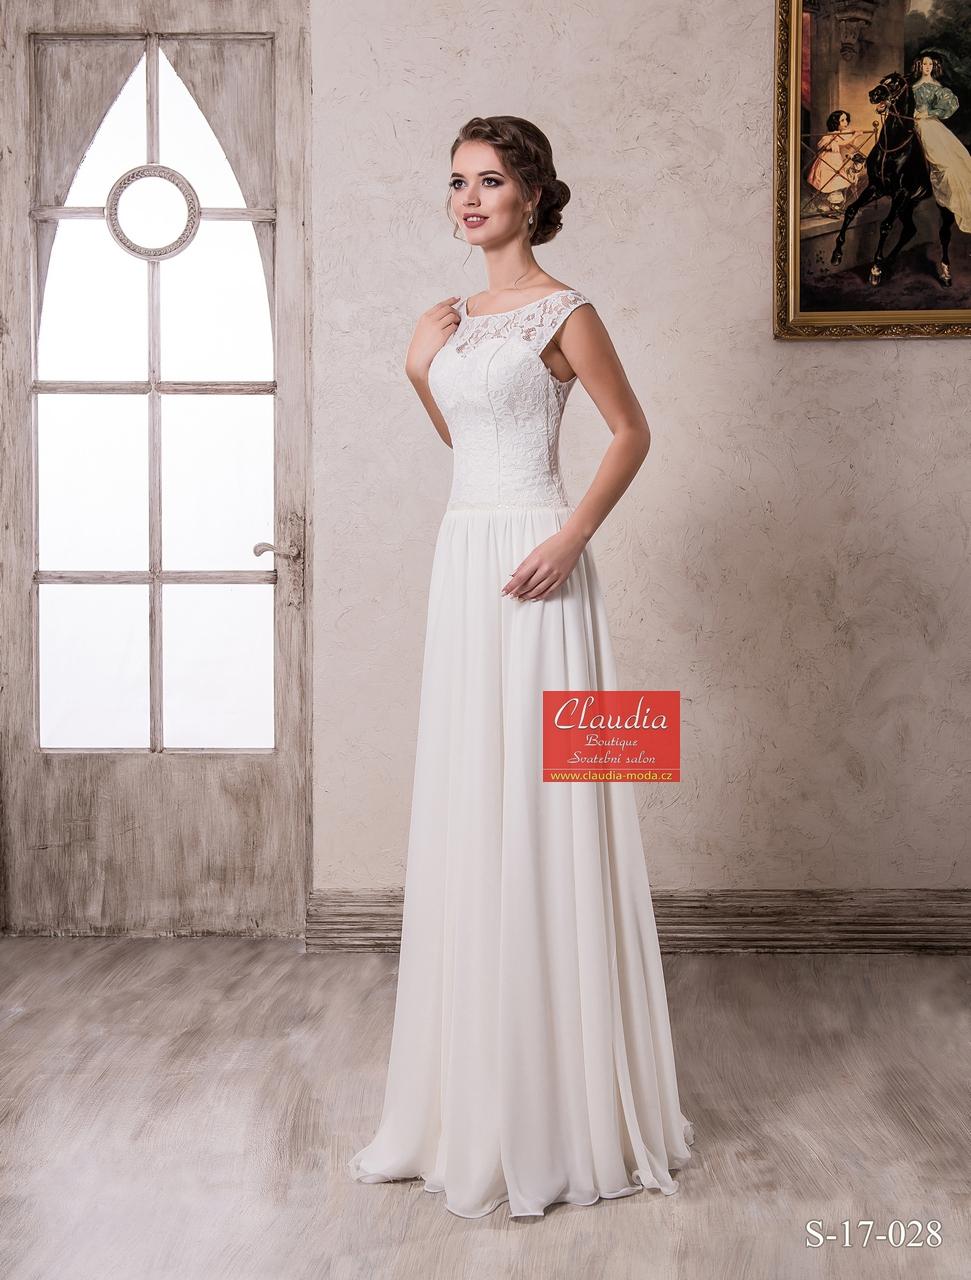 Prodej Svatebnich Satu Claudia Moda Cz